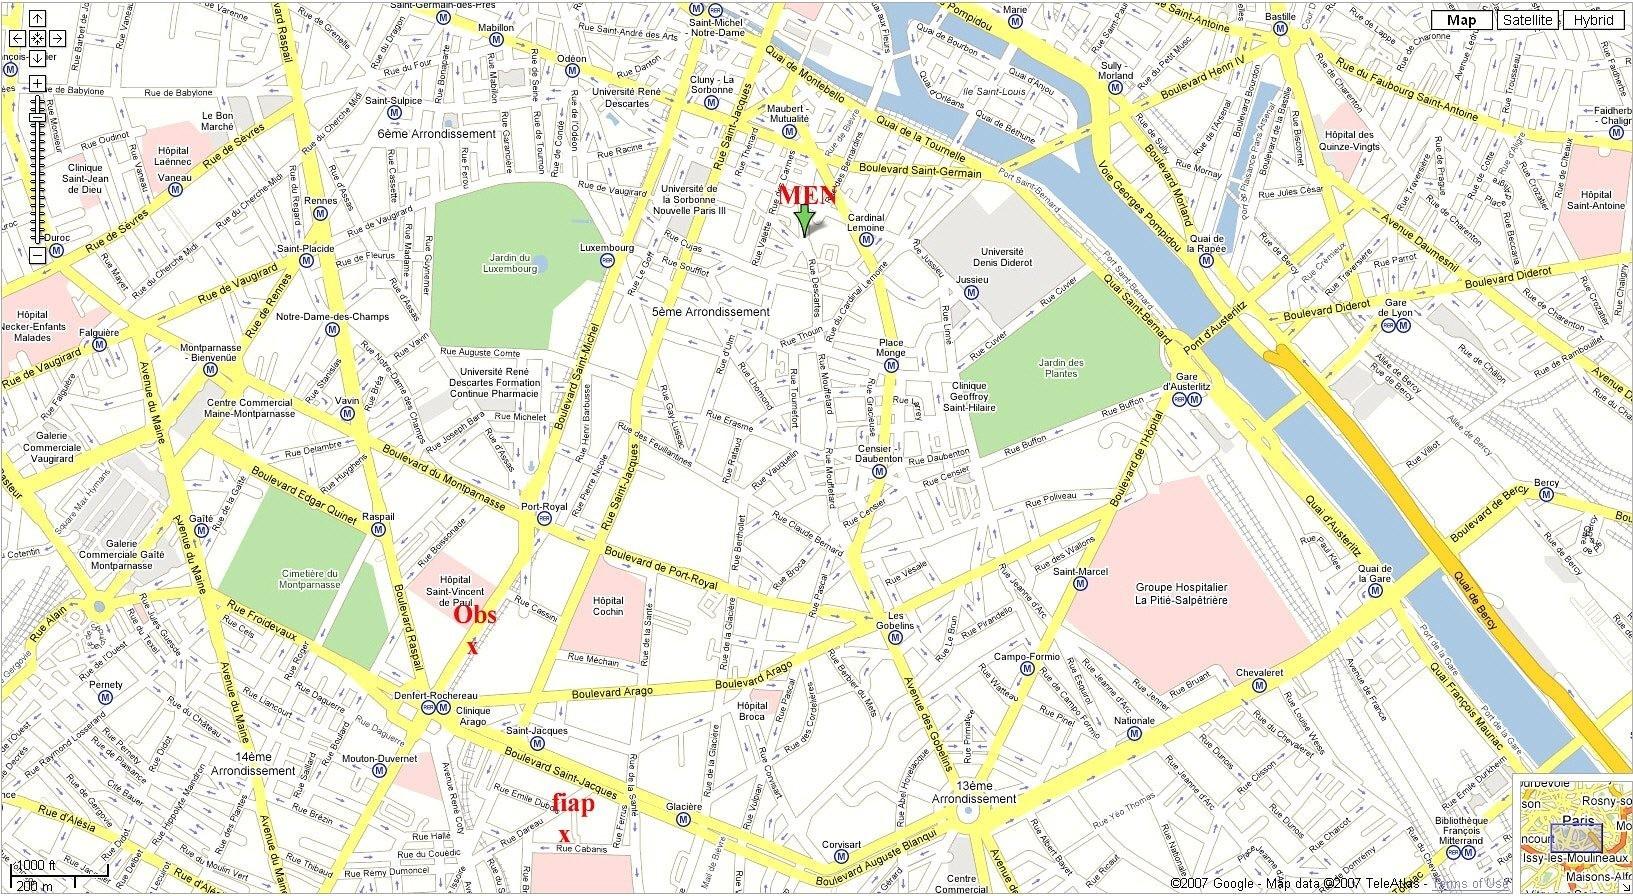 Download Street Map Paris France Major Tourist Attractions Maps And - Printable Tourist Map Of Paris France